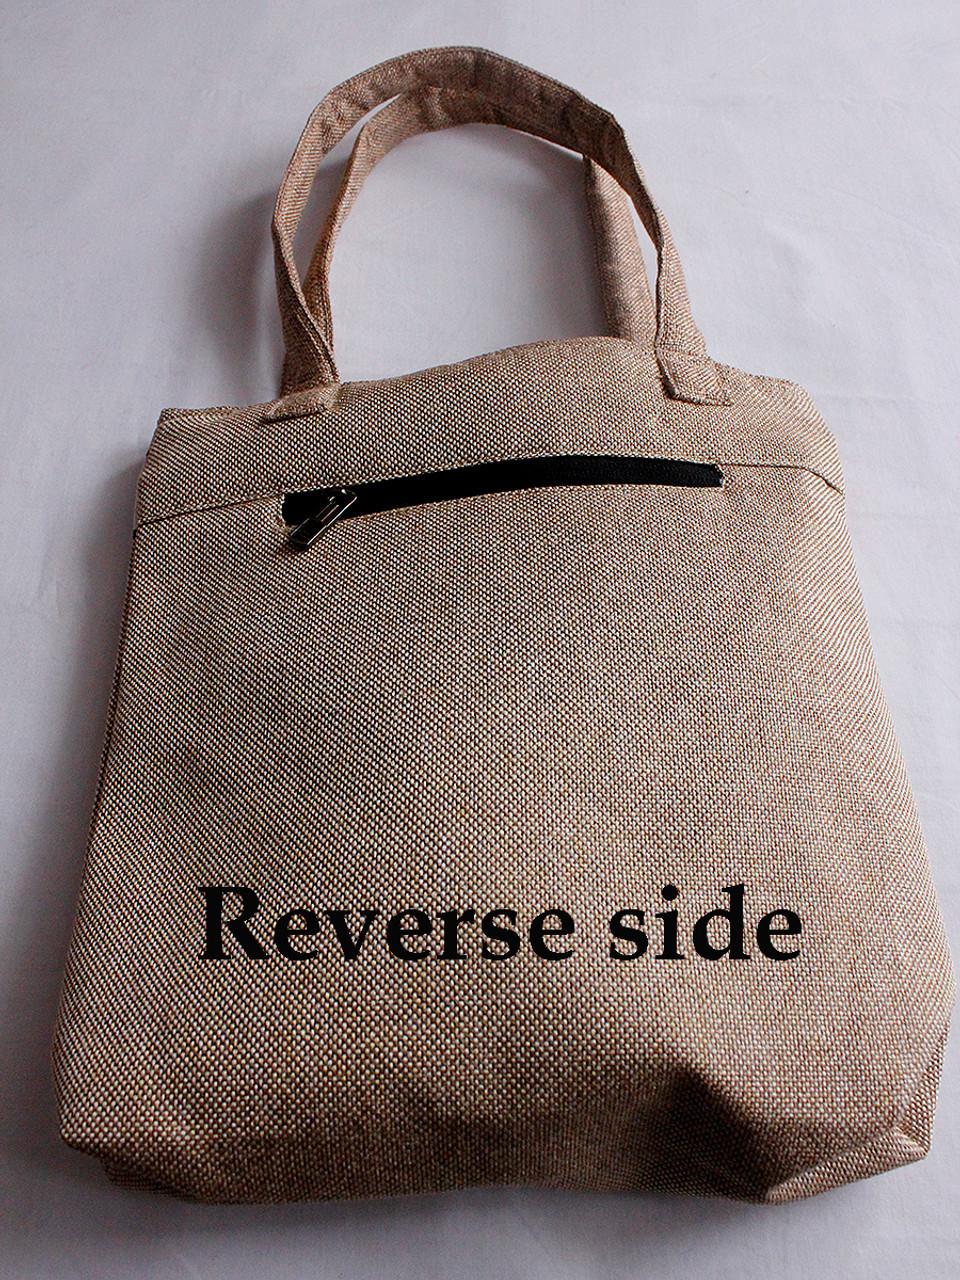 Tibetan handicraft bag